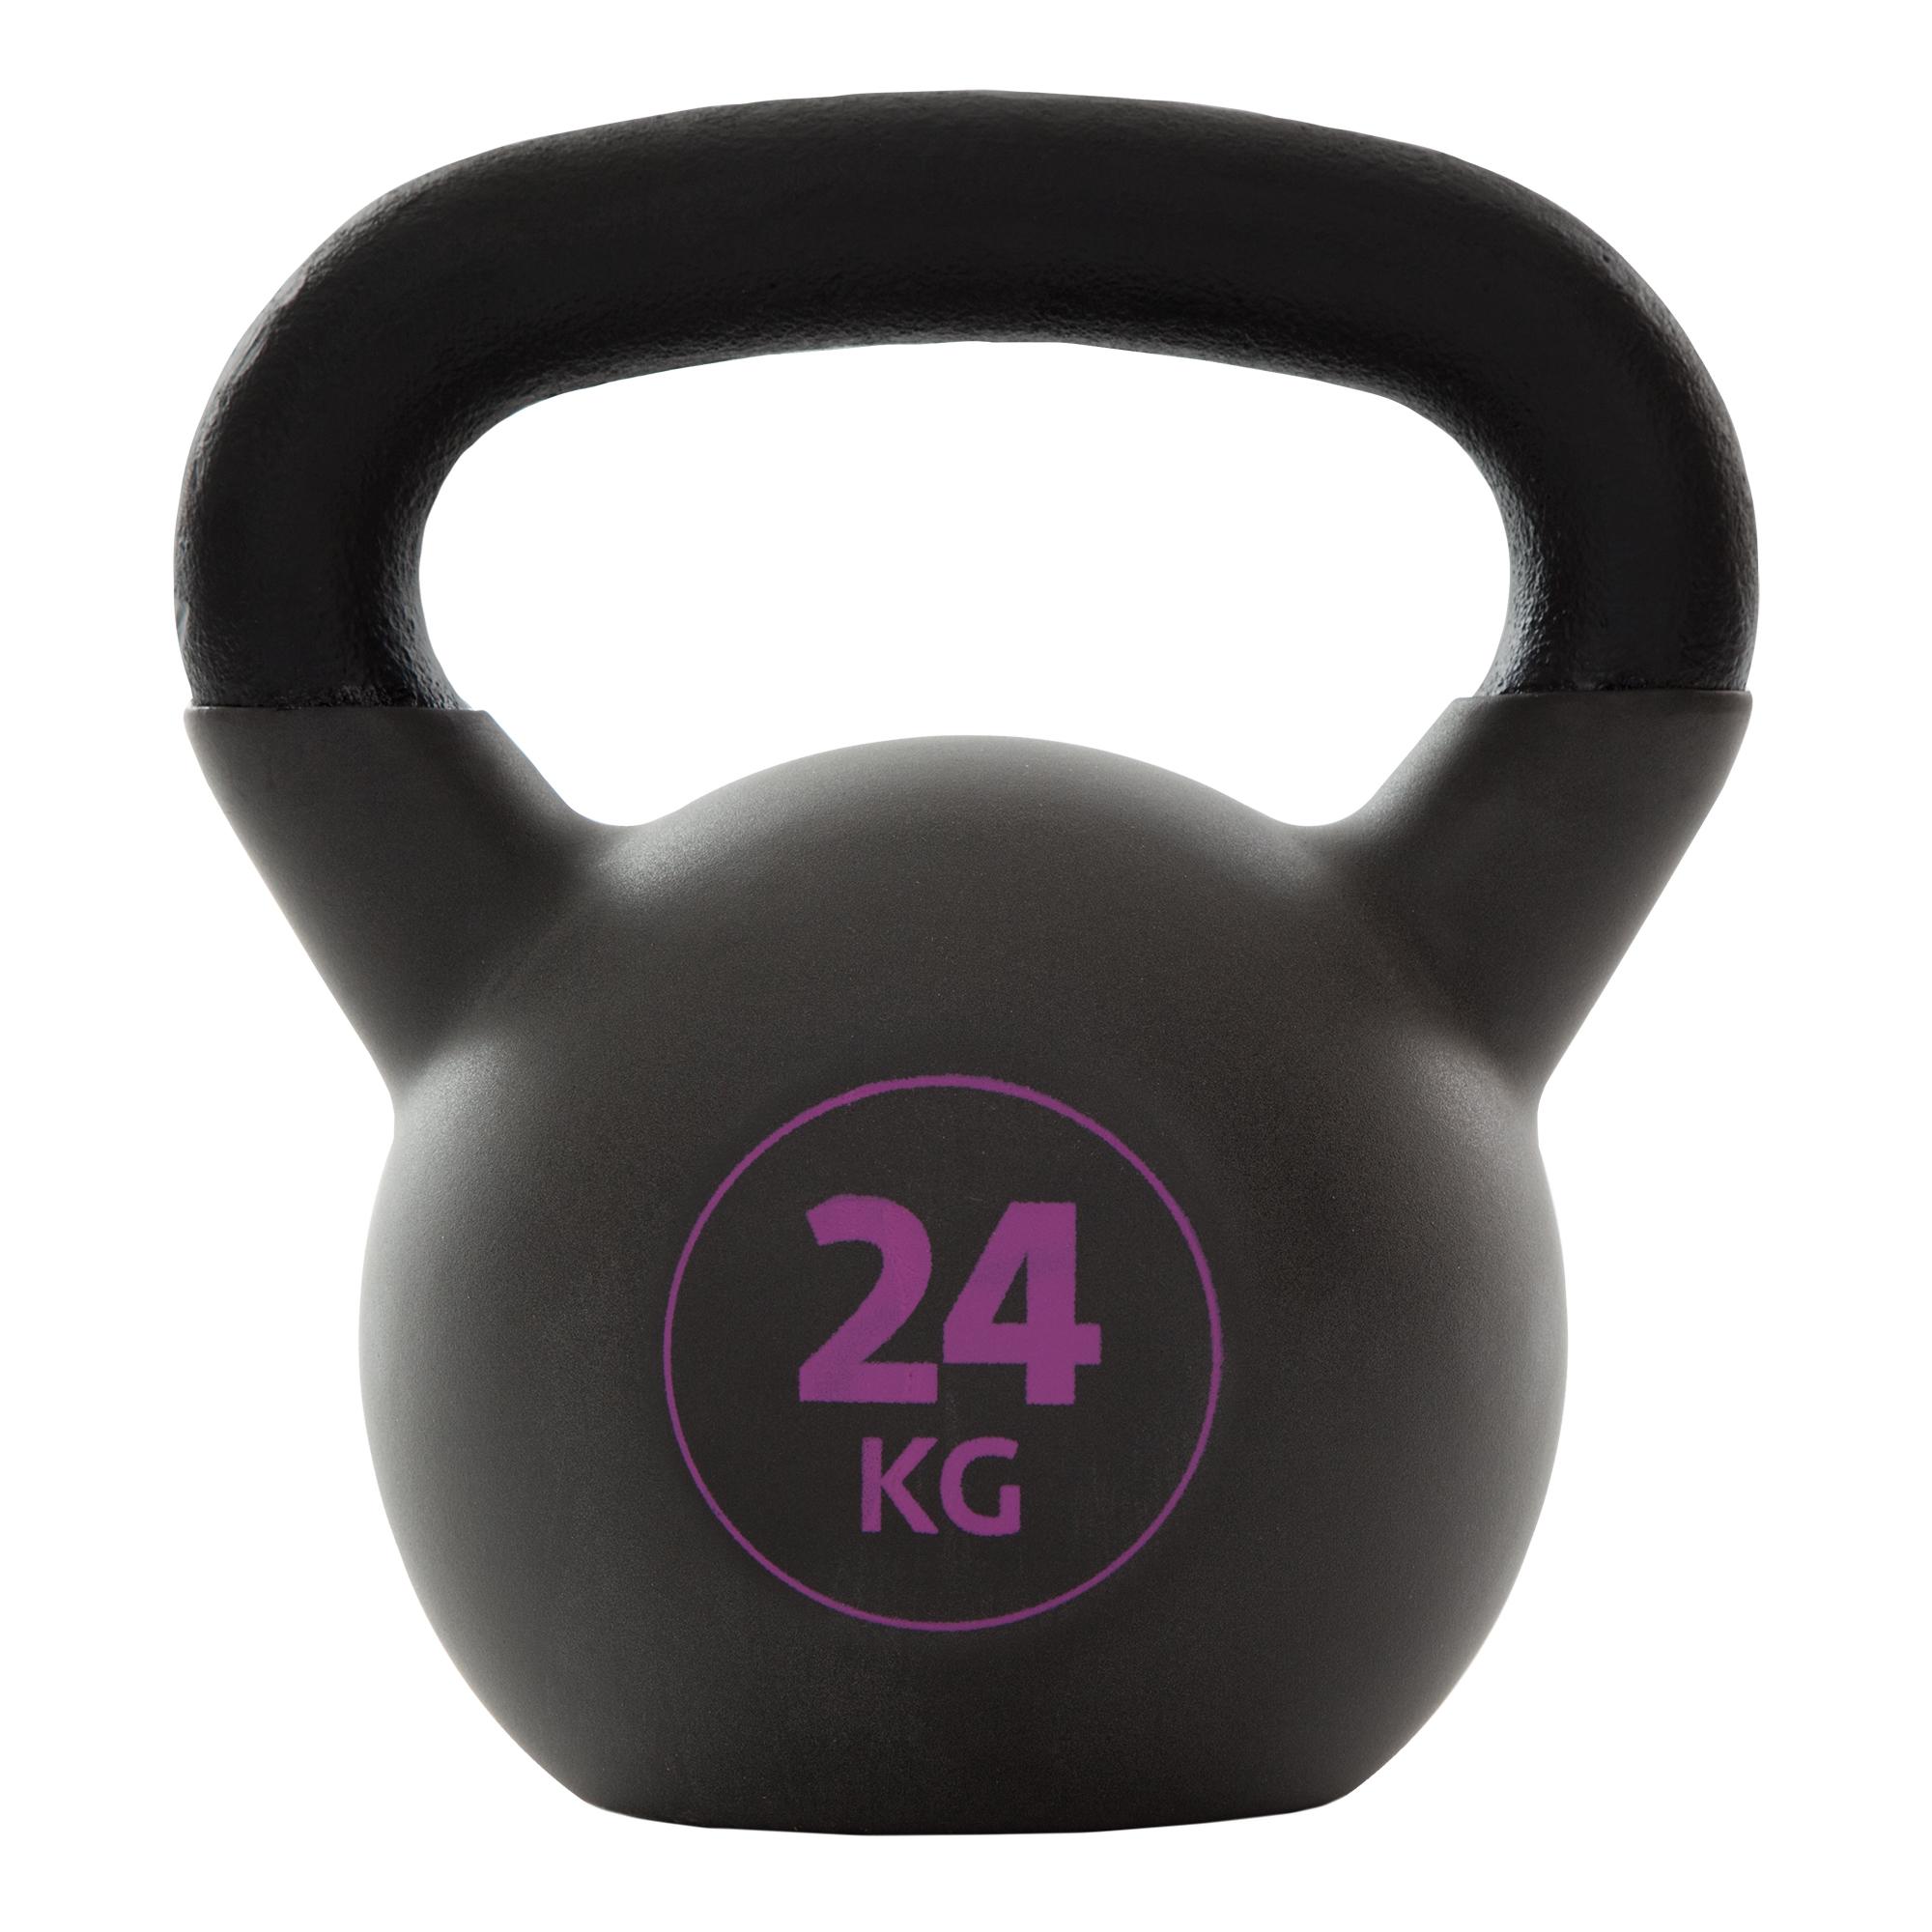 Torneo Гиря, 24 кг 1026-240 цена